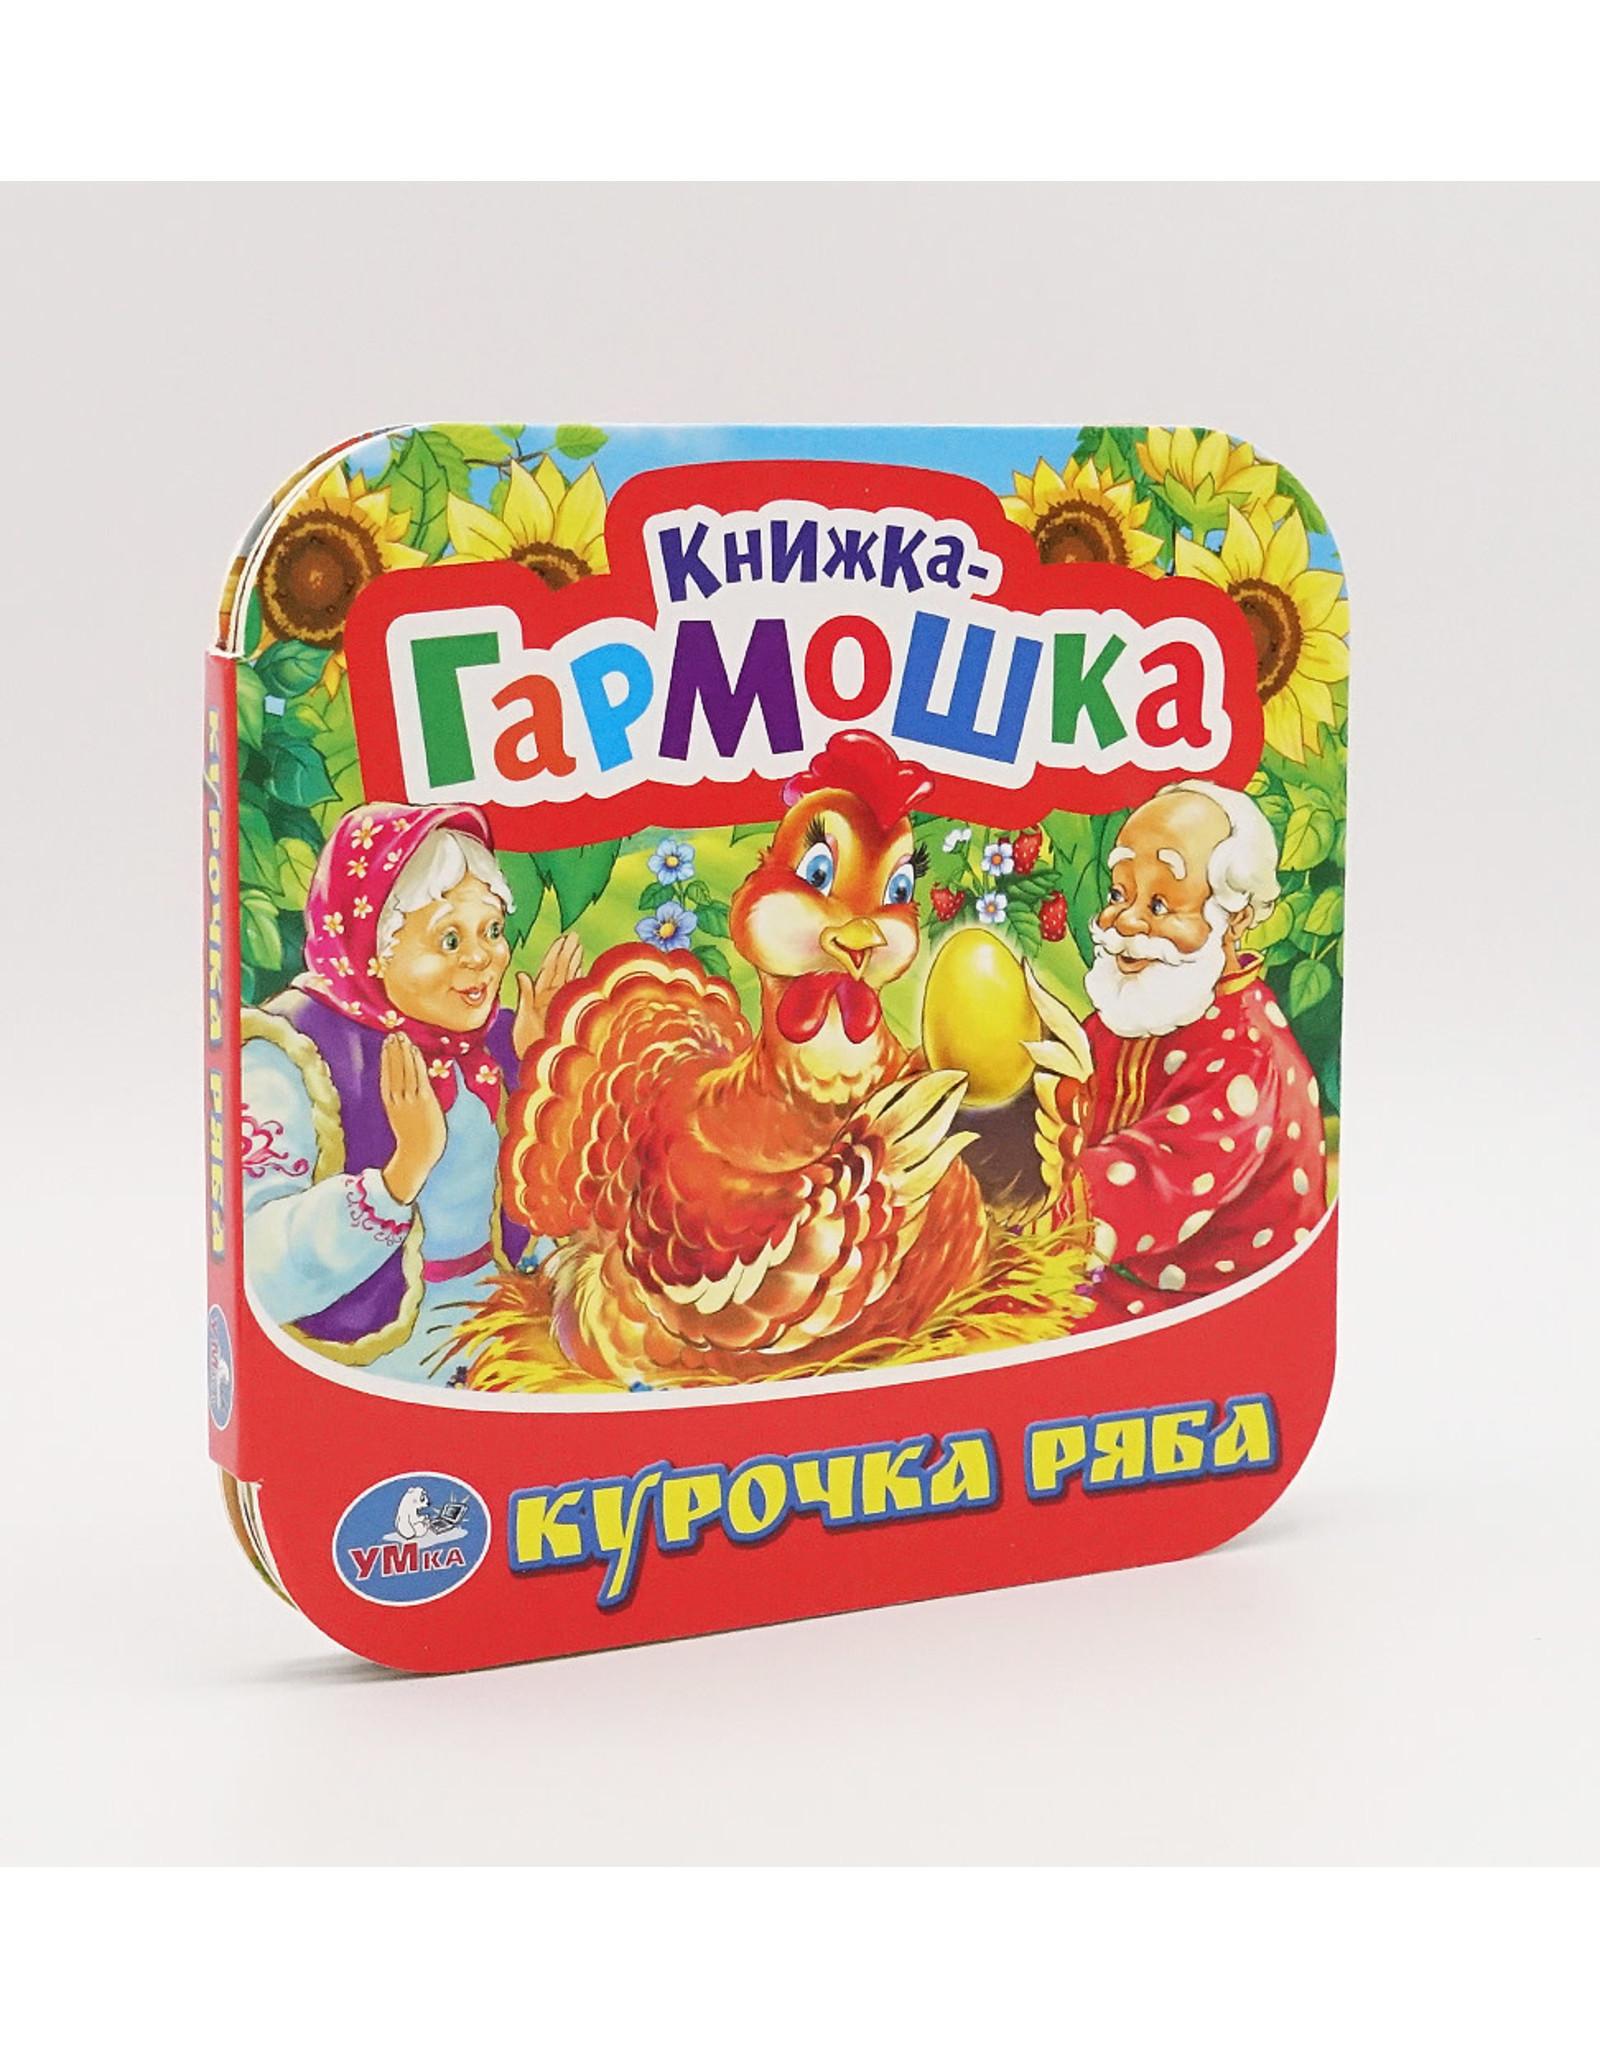 Accordion Book, Ryaba Chicken